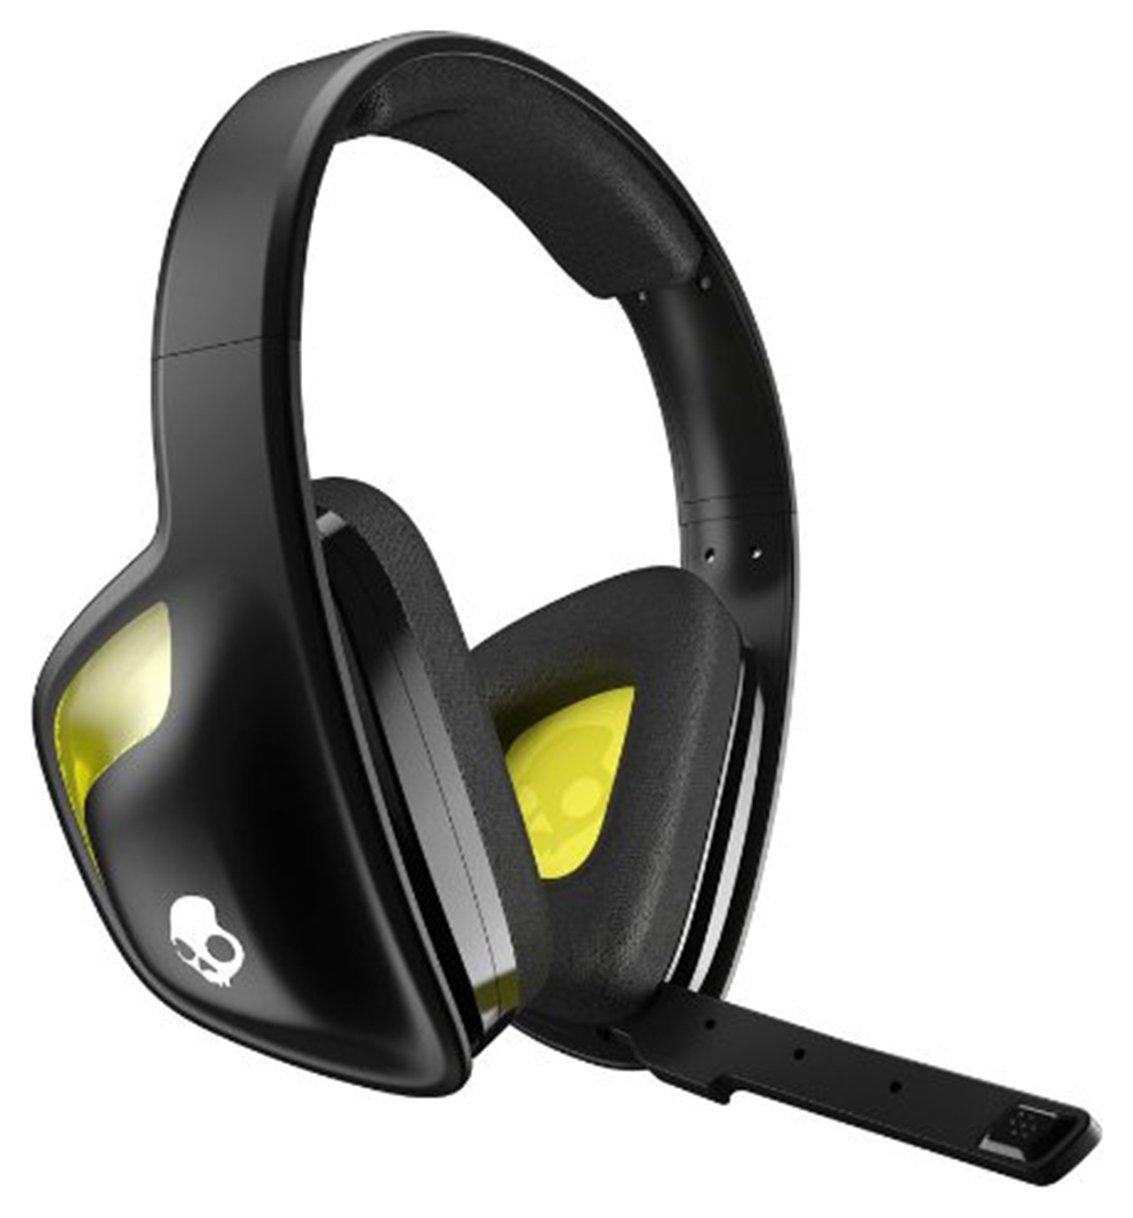 Skull Candy Skullcandy SLYR Gaming Headset for Xbox 360/PS3.